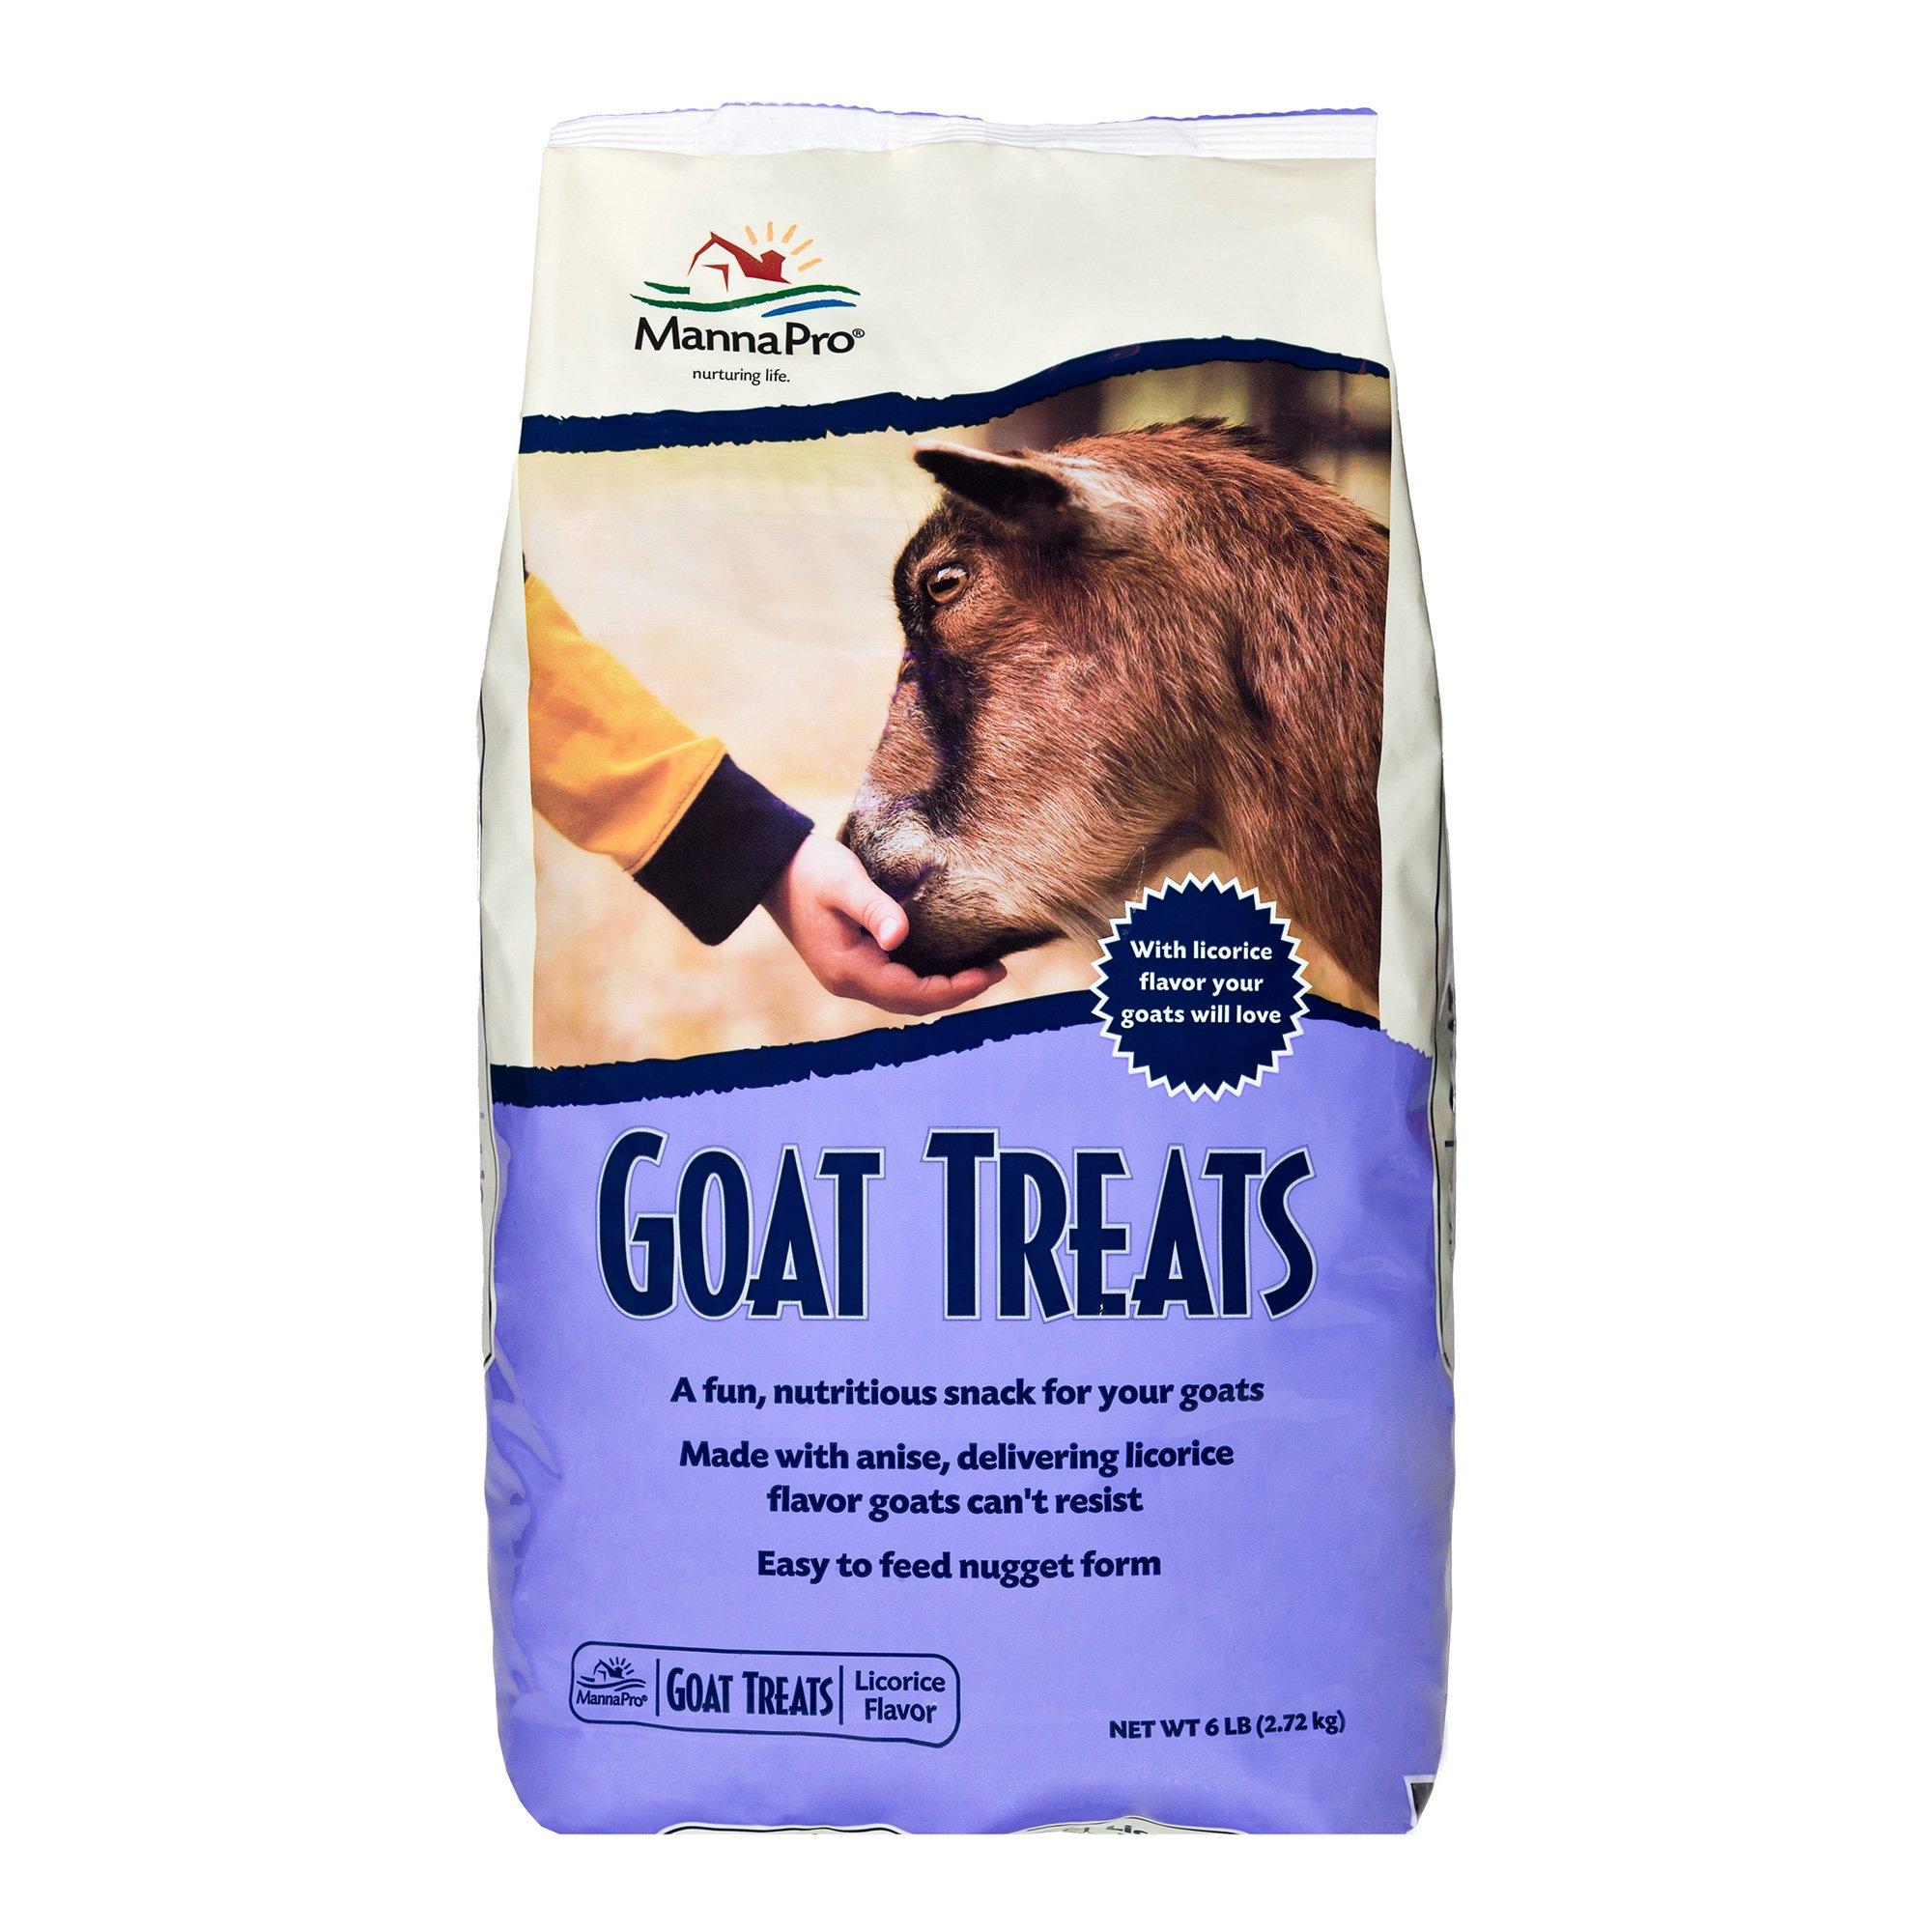 Manna Pro Licorice Goat Treats, 6 lb